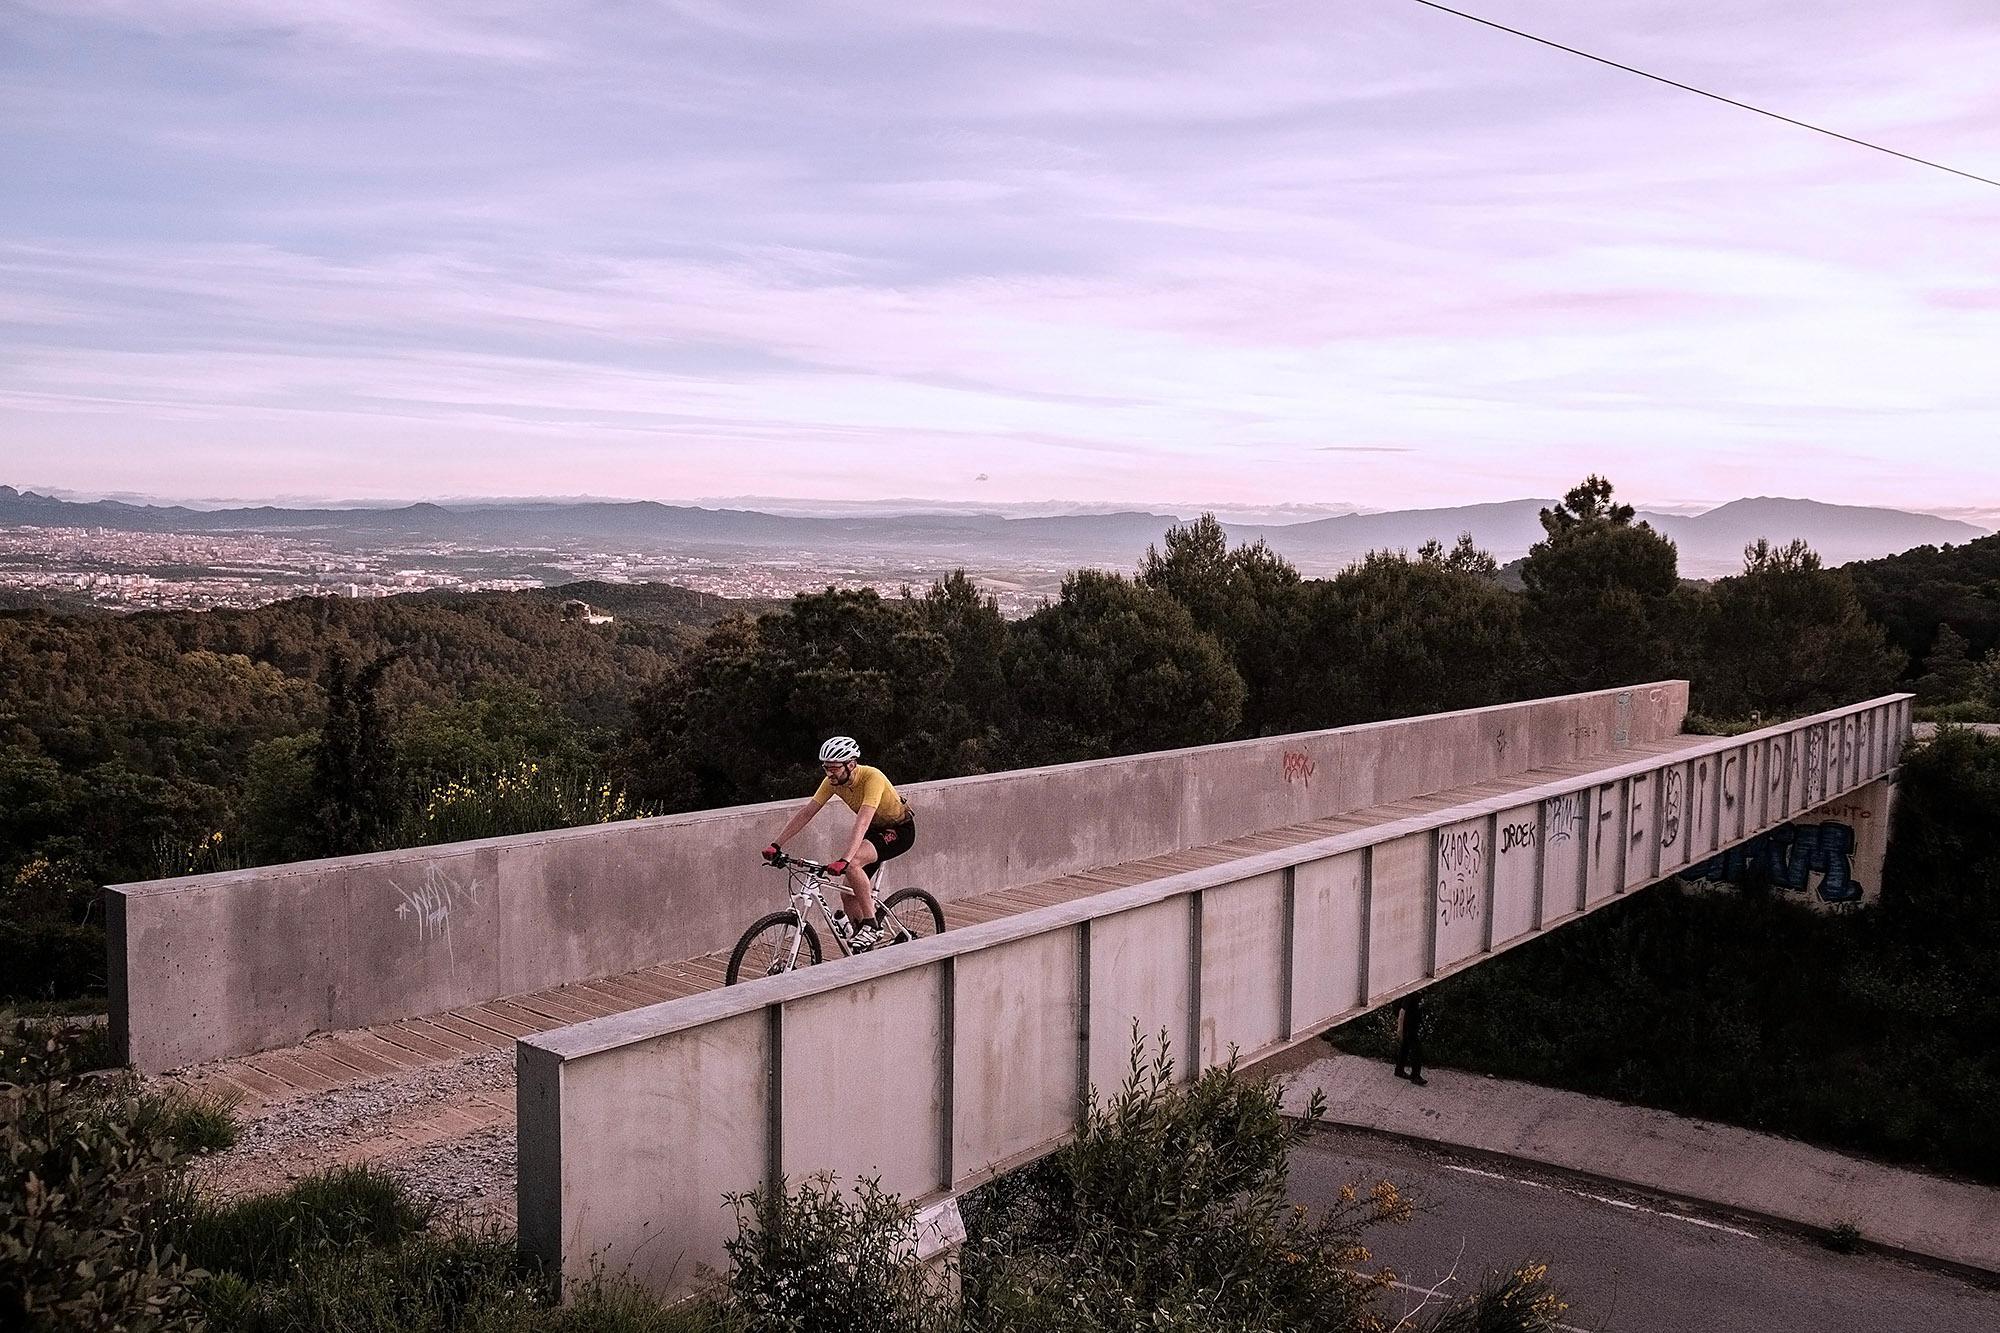 Bikepath bridge over a main road at the Collserola Natural Park.